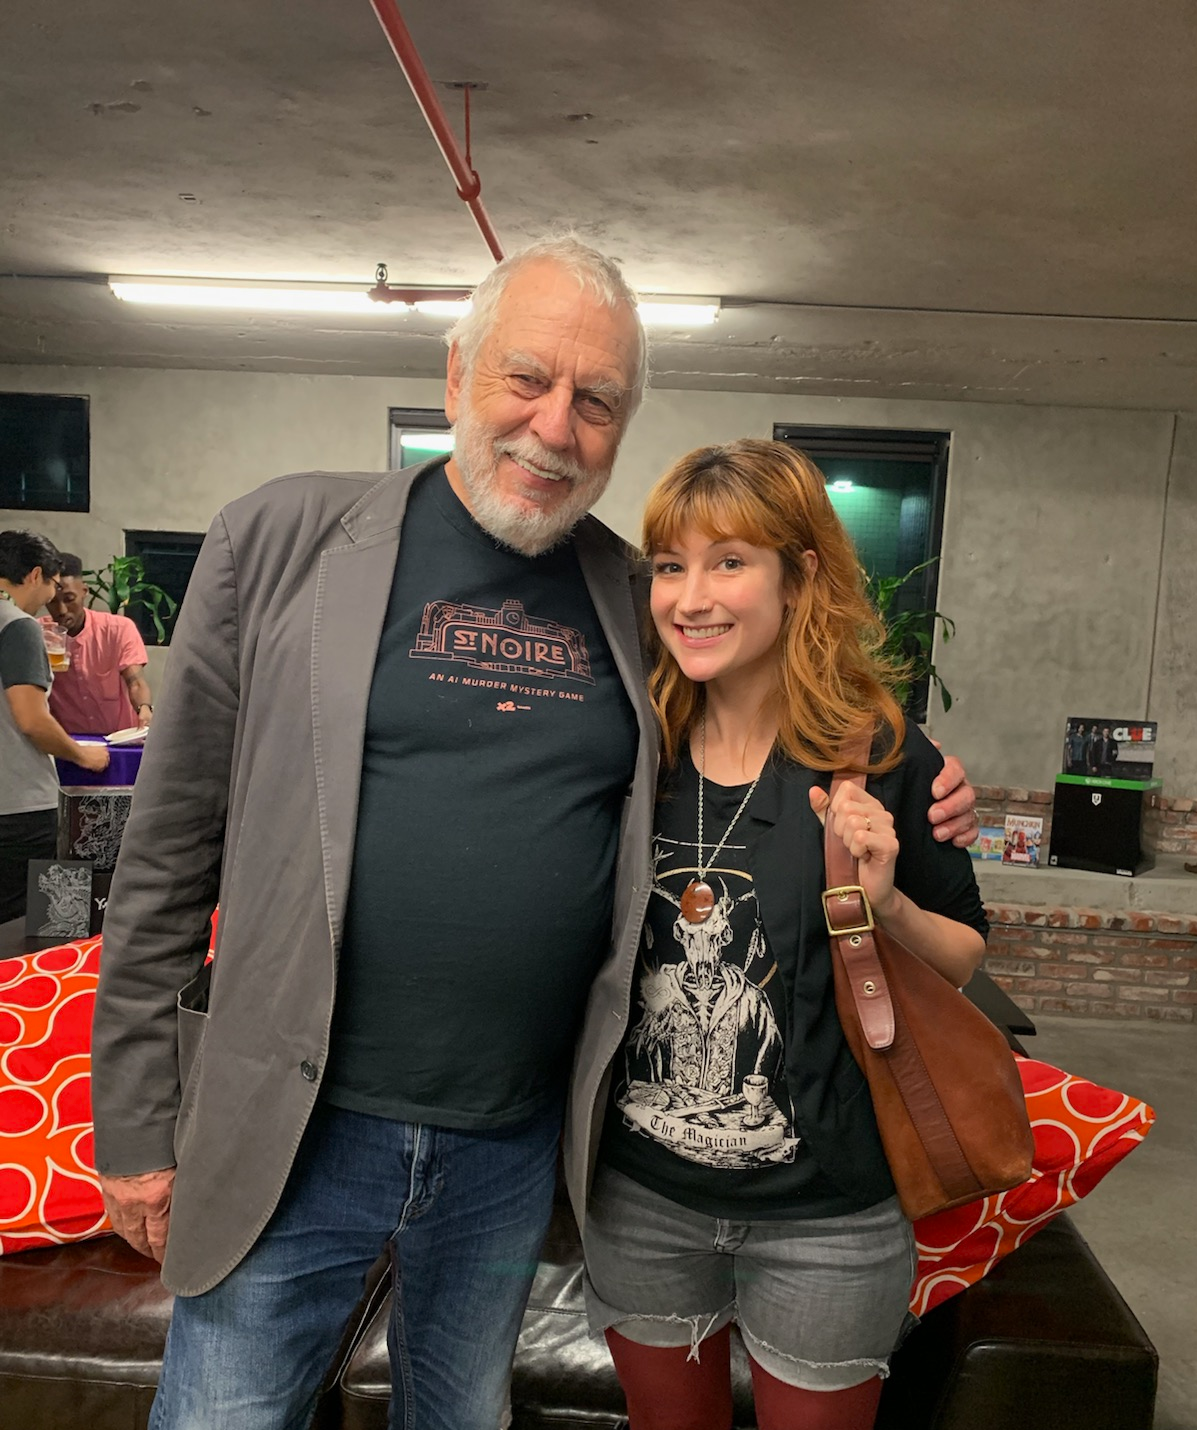 LA Sept 2019 event Nolan Bushnell and An